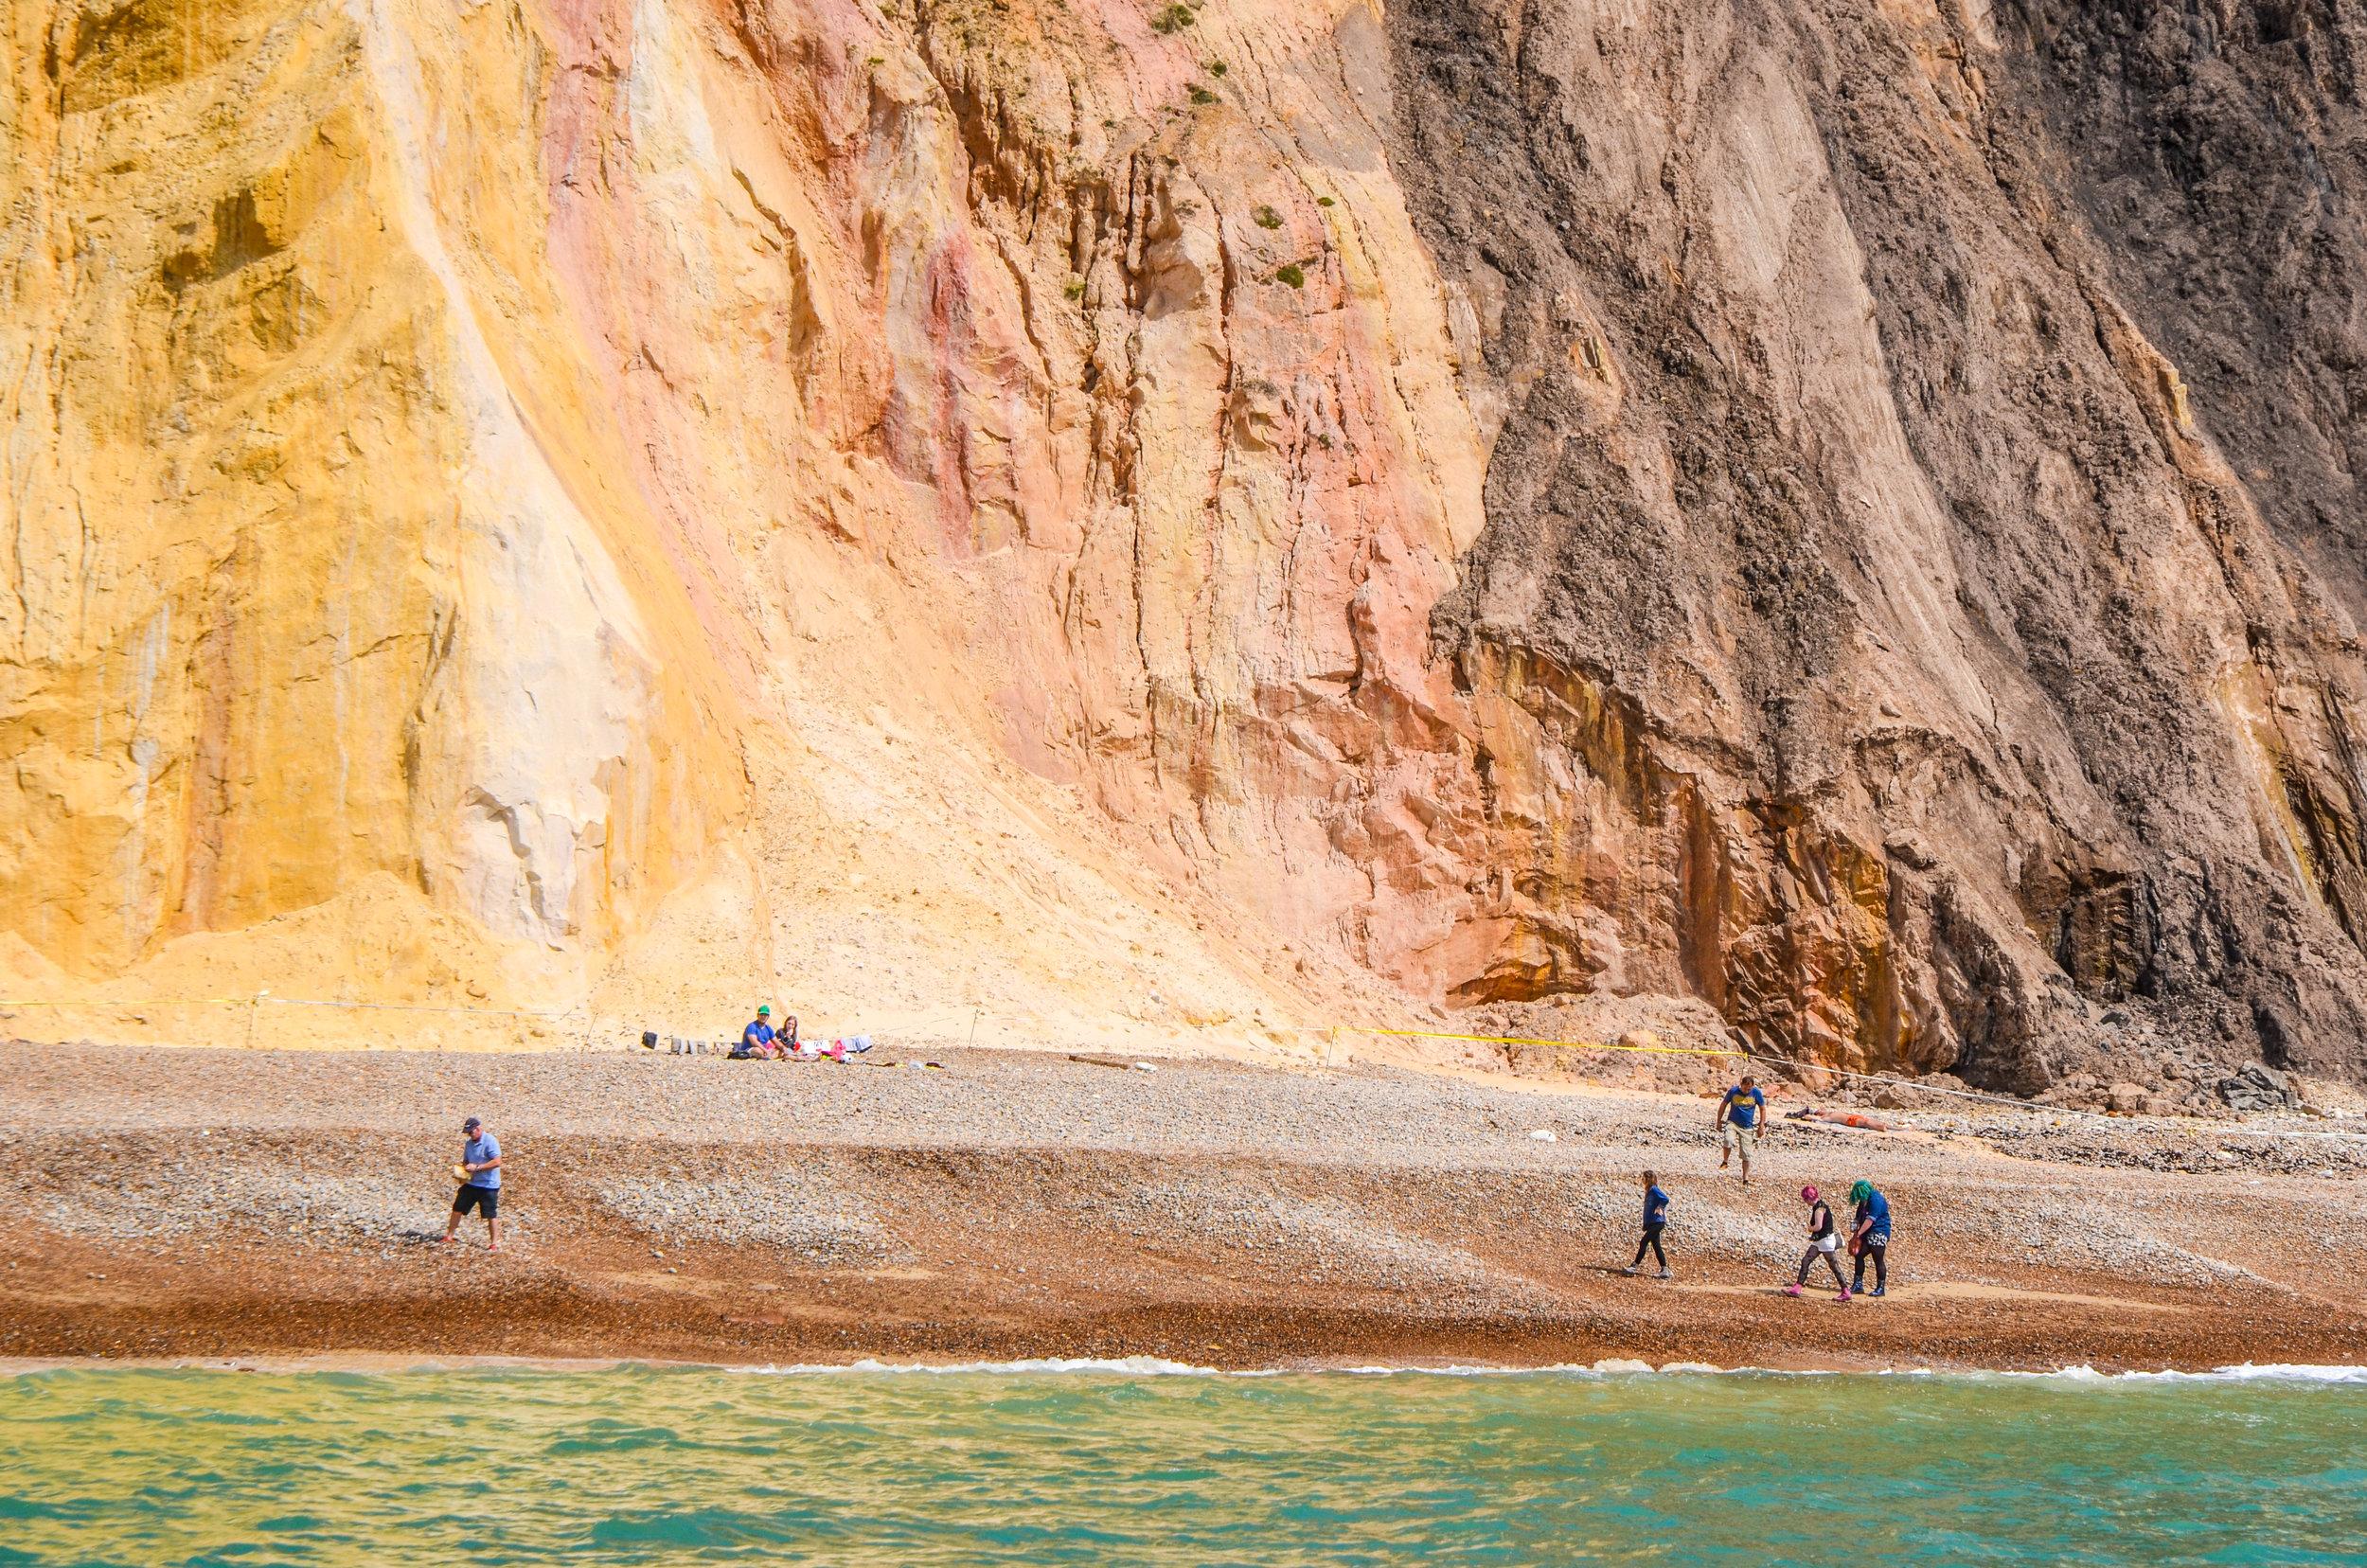 coloured-sands-of-alum-bay_14335958270_o.jpg